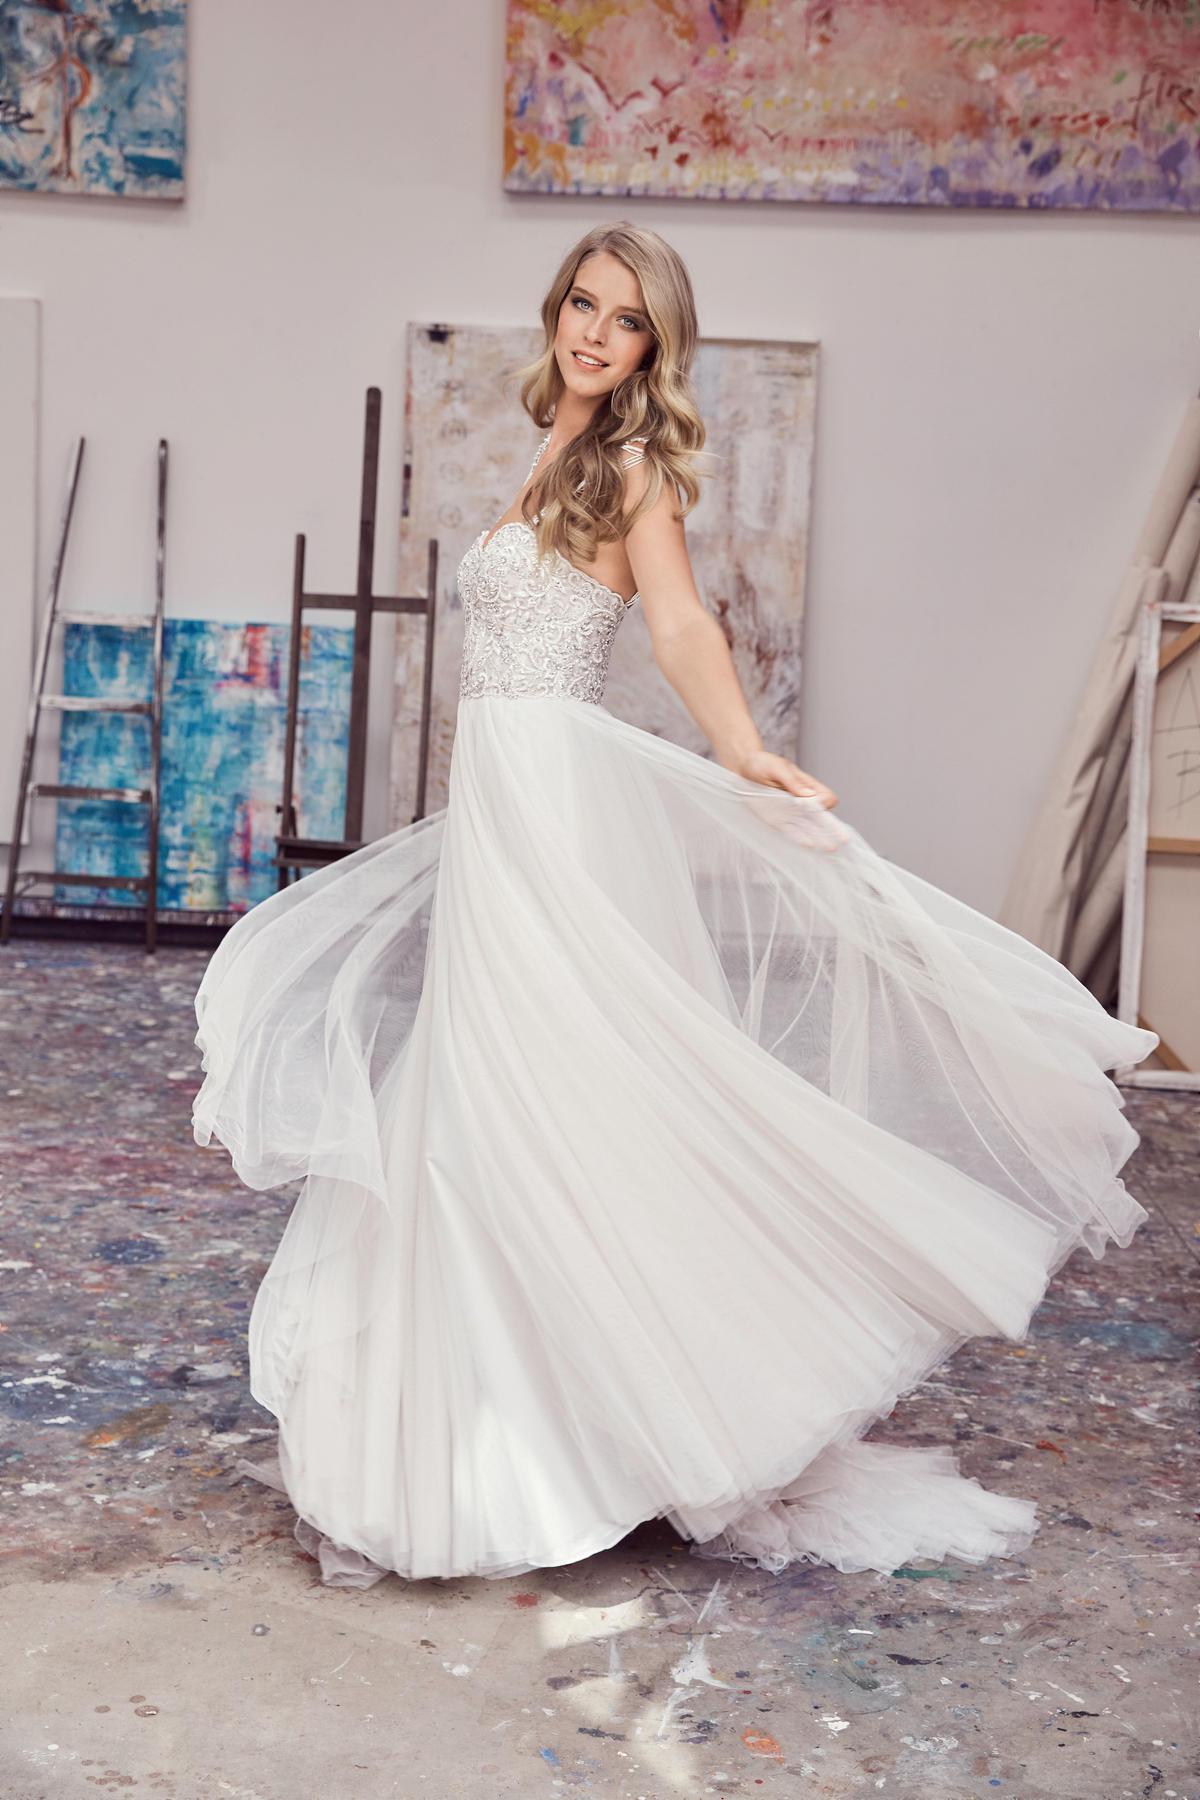 Wedding Gowns San Diego  Watters Wedding Dresses & Bridal Gowns In San Diego